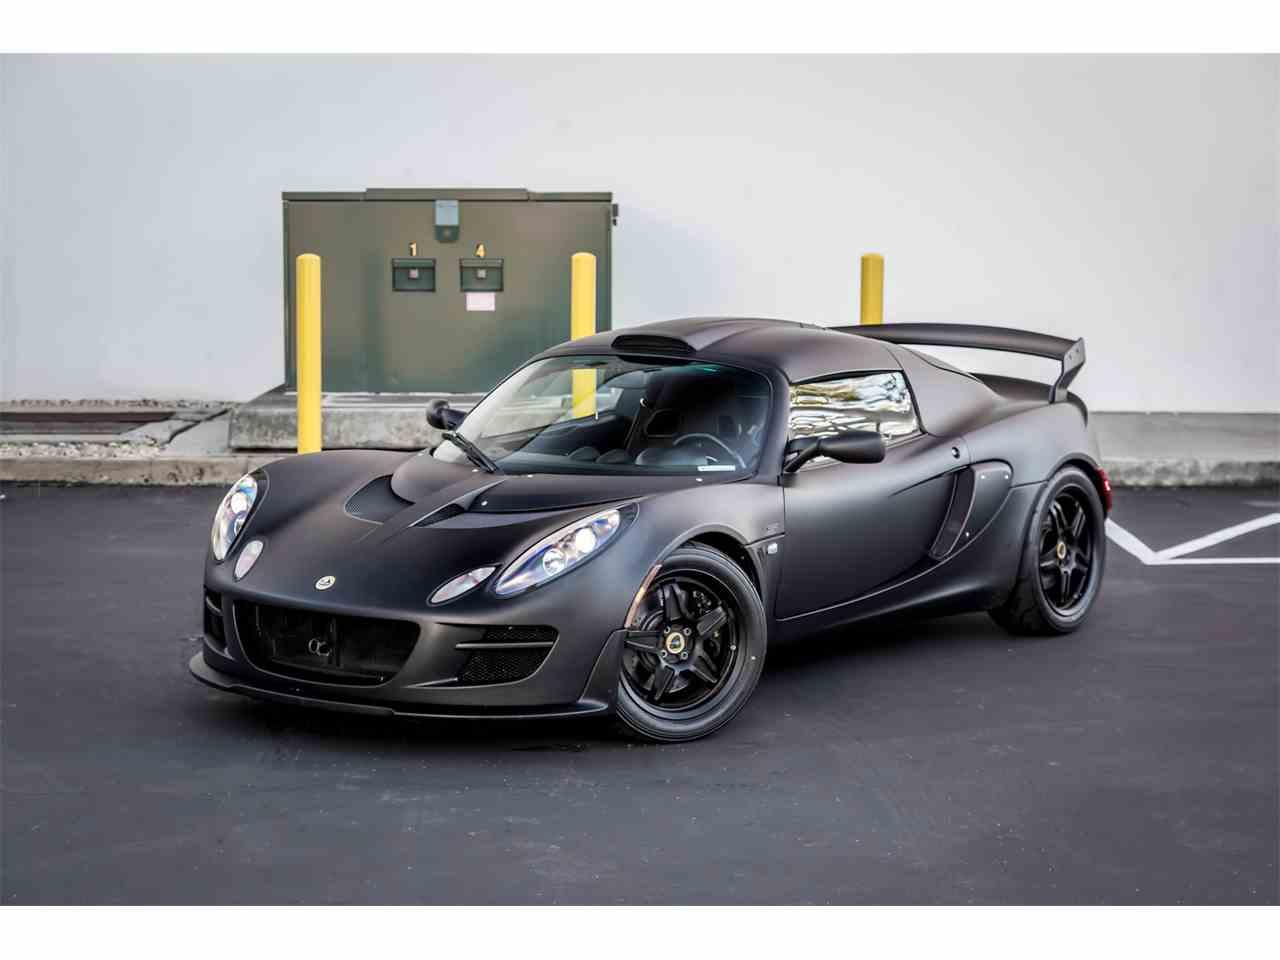 2011 Lotus Exige for Sale - CC-992774